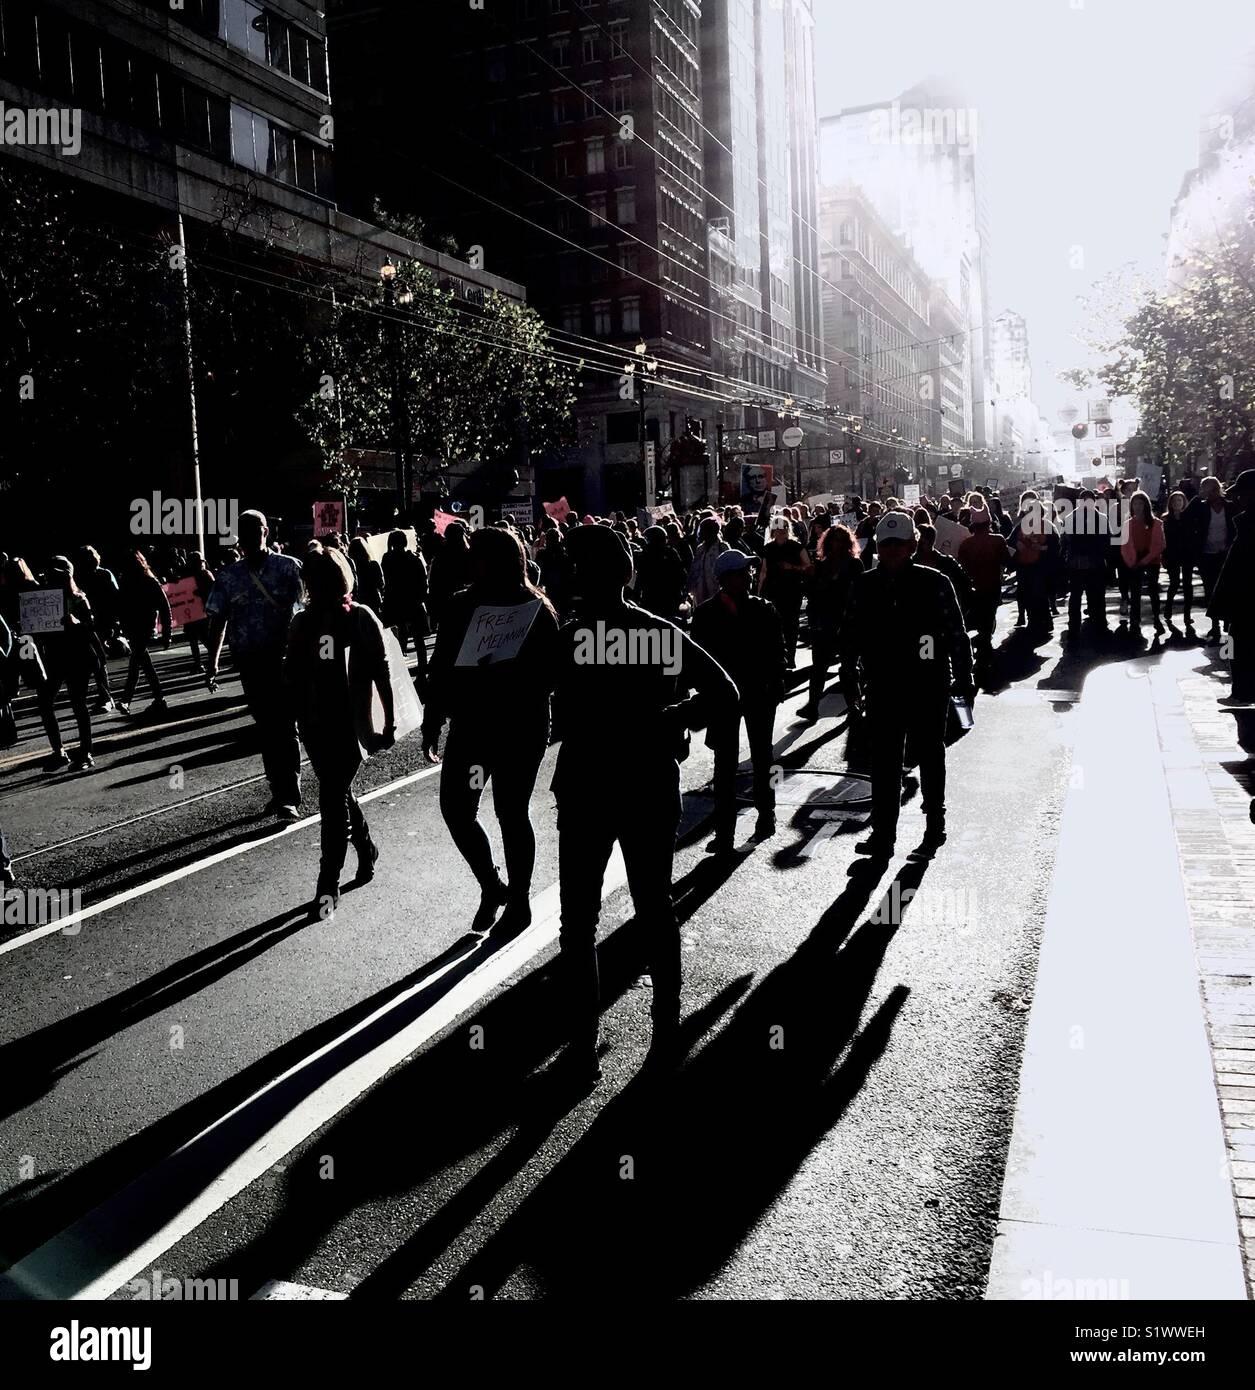 womens-march-san-francisco-california-usa-january-20-2018-S1WWEH.jpg